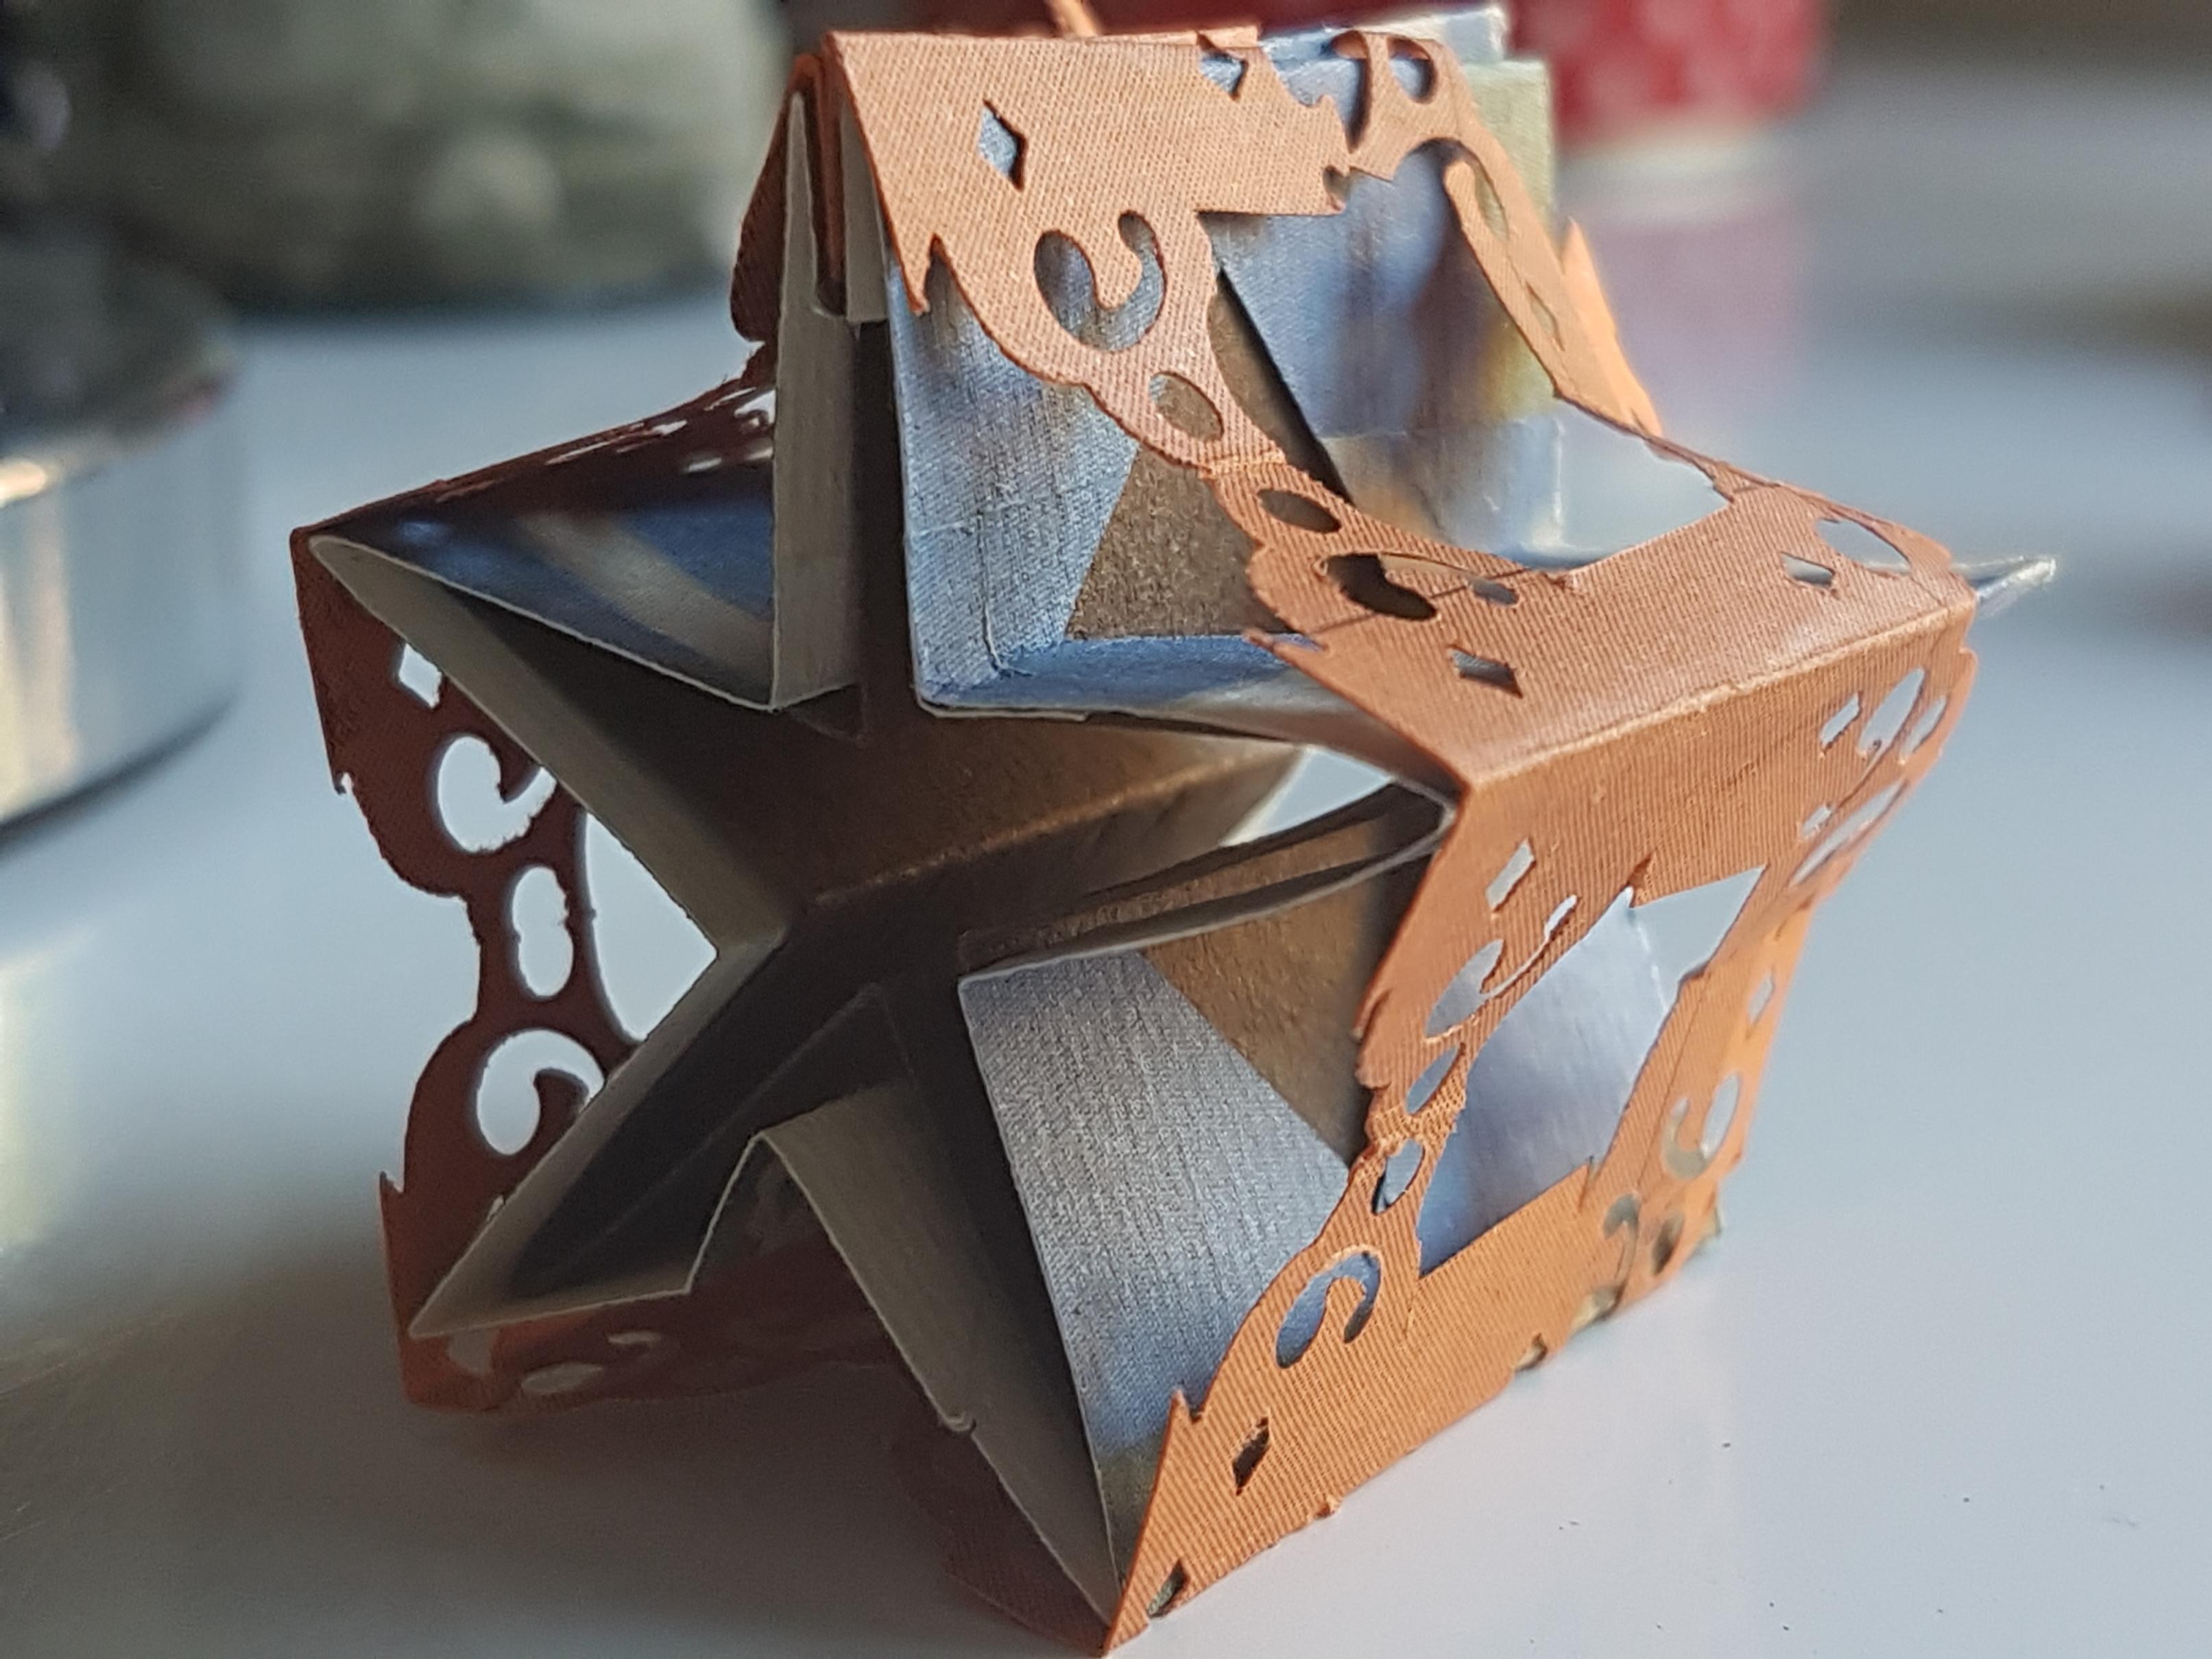 cindy-tonkin-star-carousel-3x3x3-2016-20161106_0818192